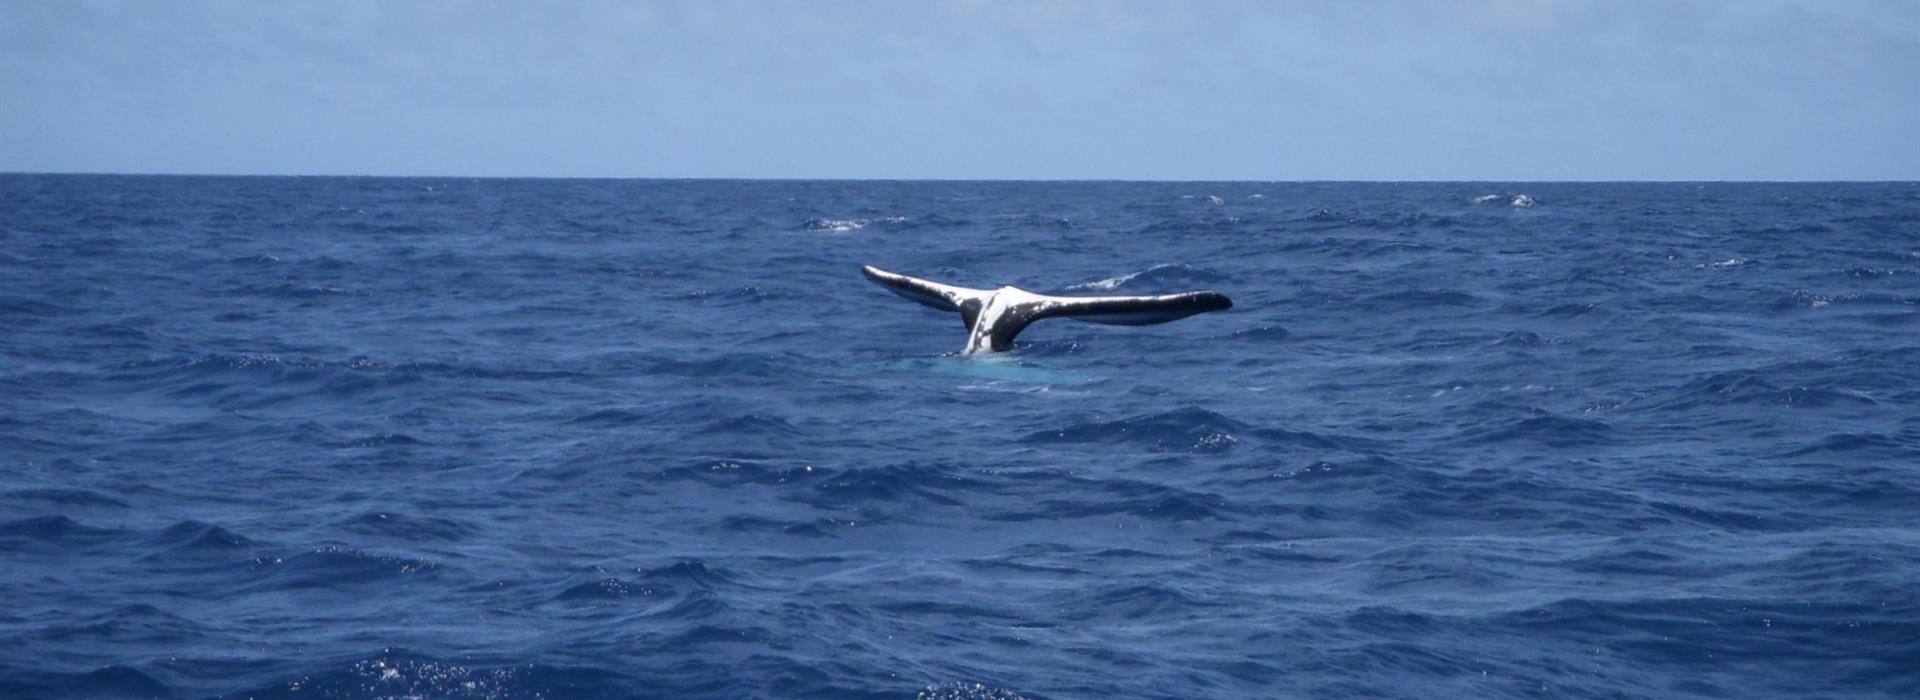 Whale at Bird Island, Seychelles